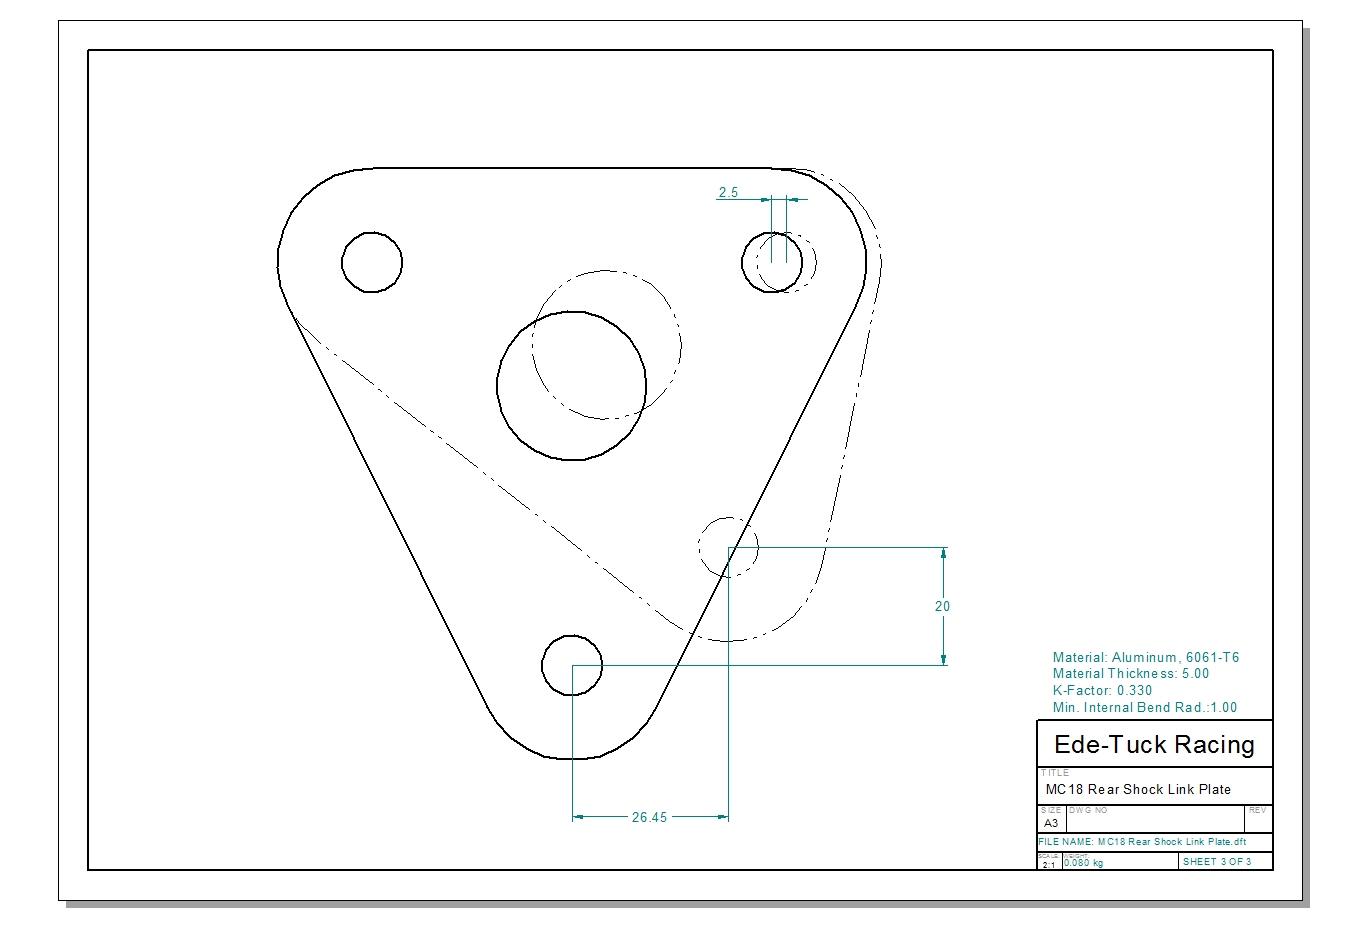 Nsr250 Forum Rear Shock Link Plate Options Part 1